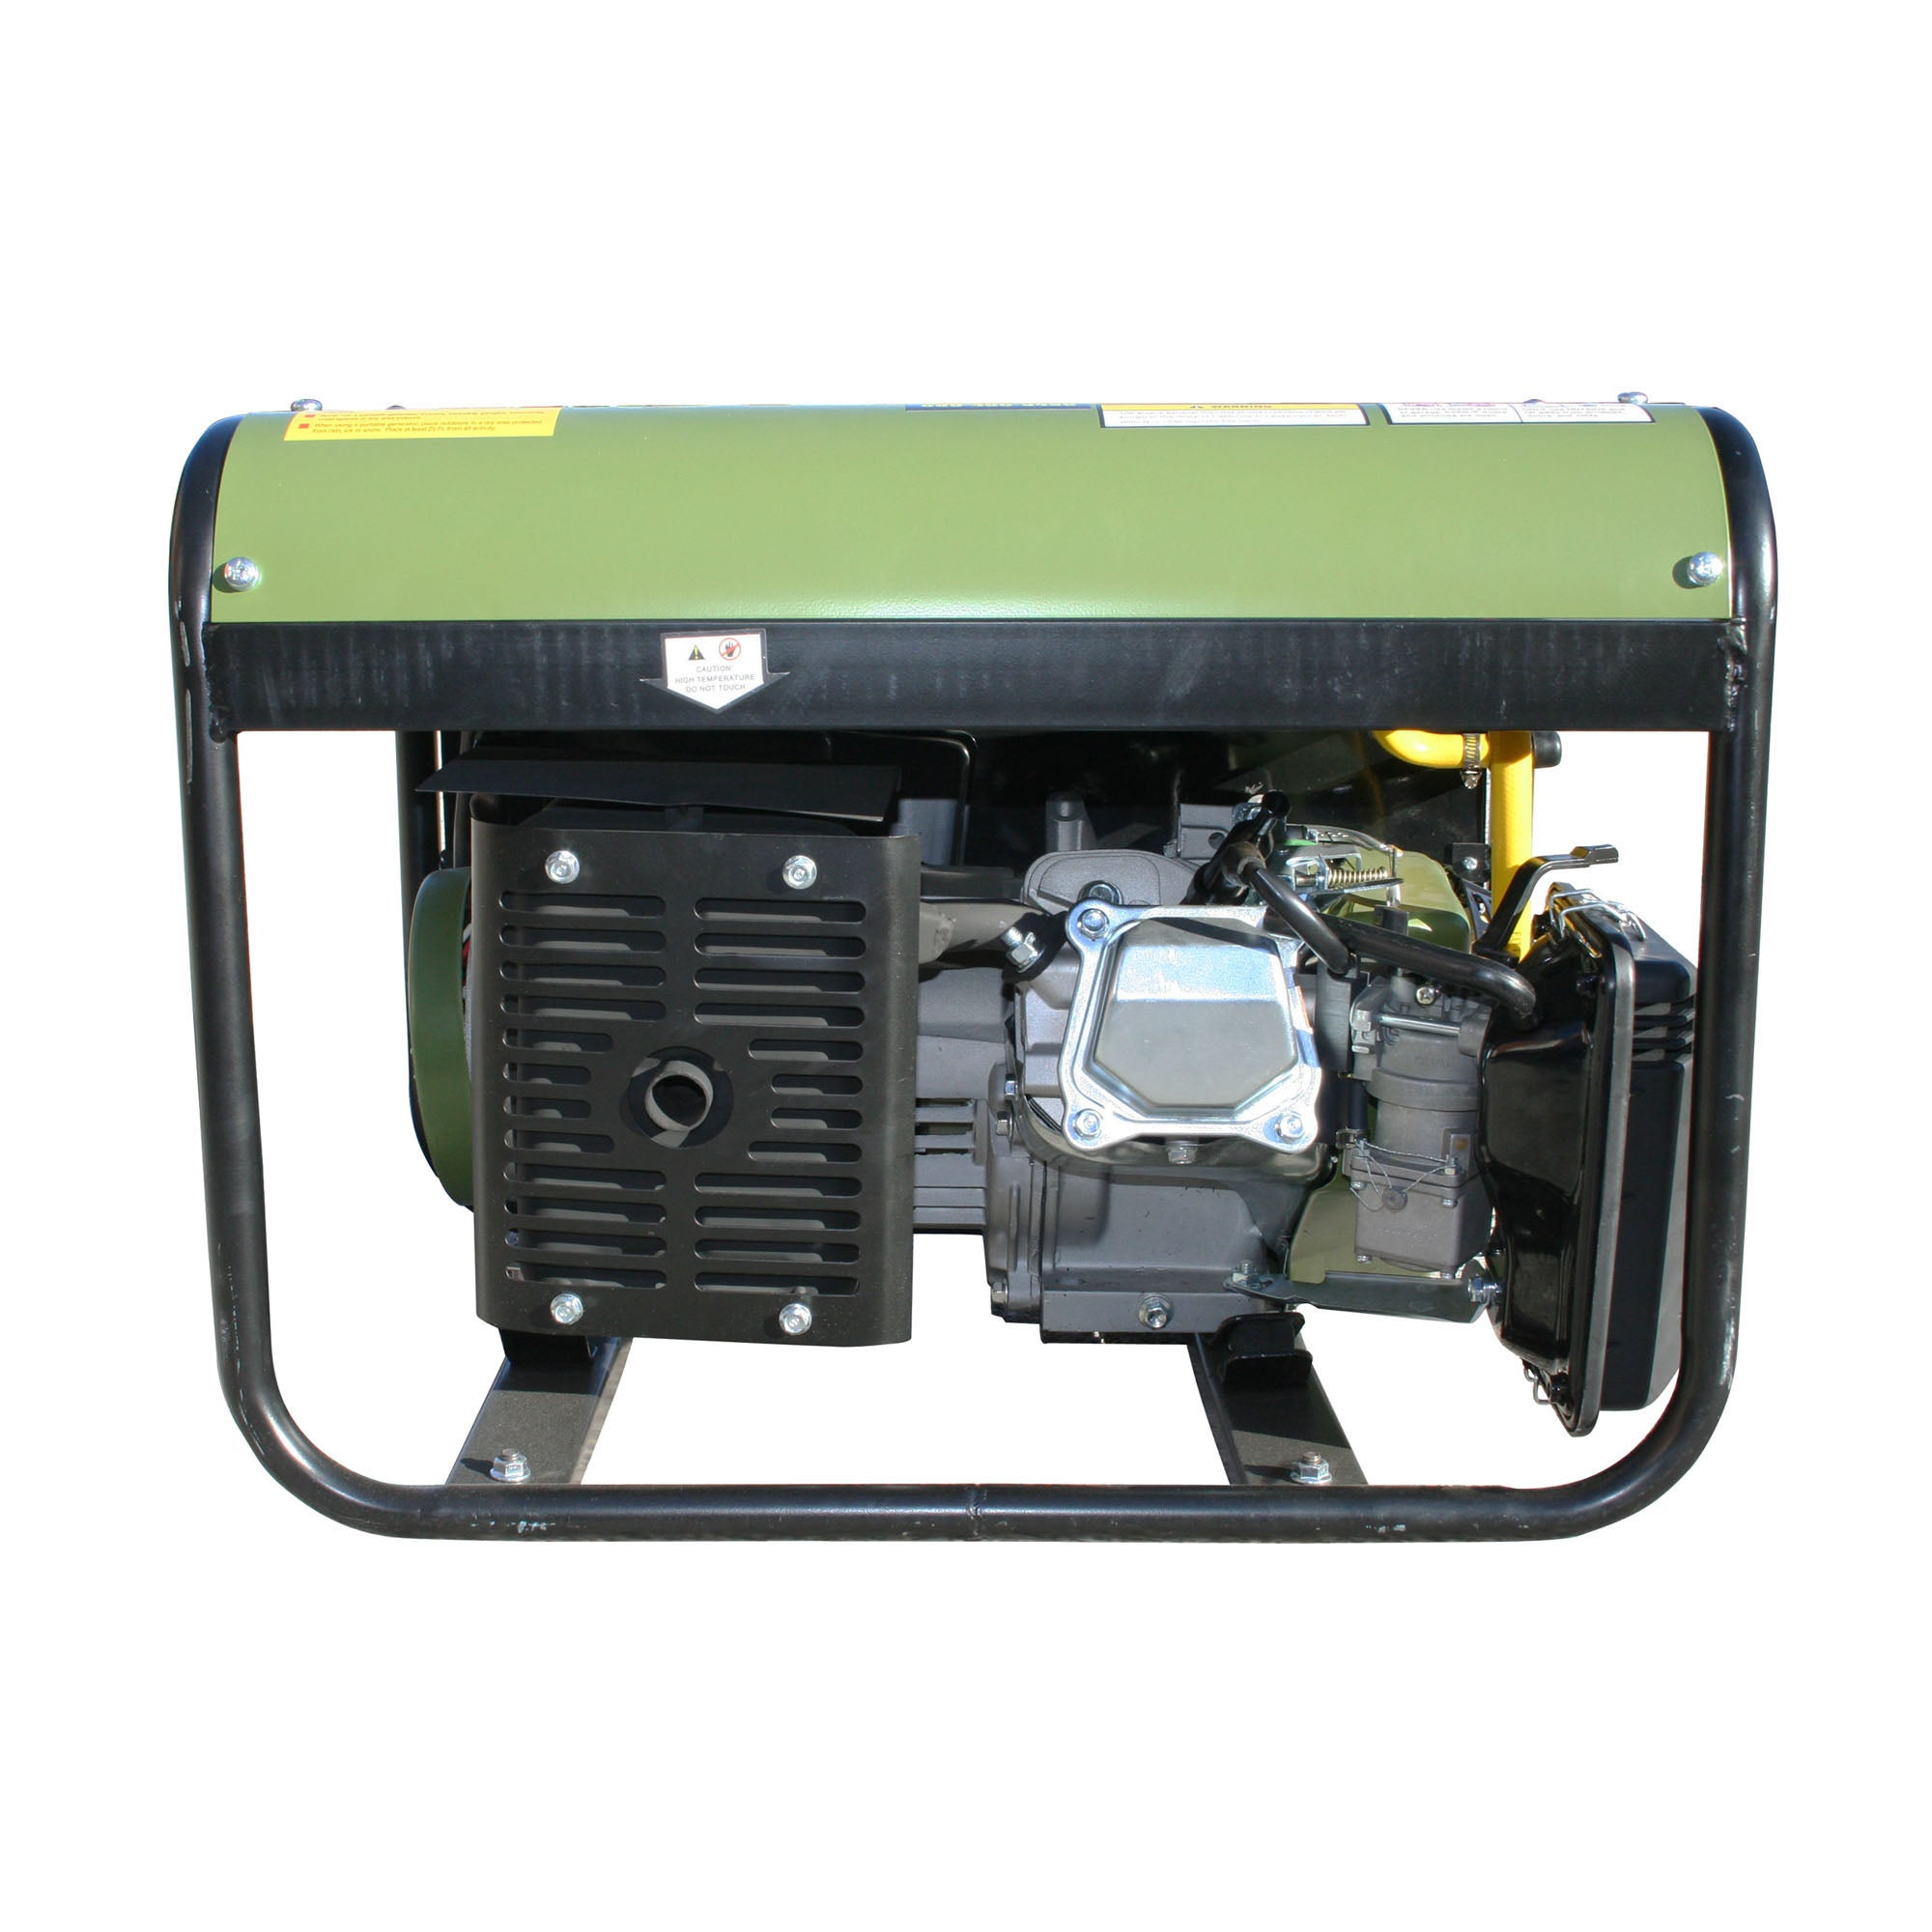 Sportsman Series Propane 4000 Watt Generator Free Shipping Today 5986361